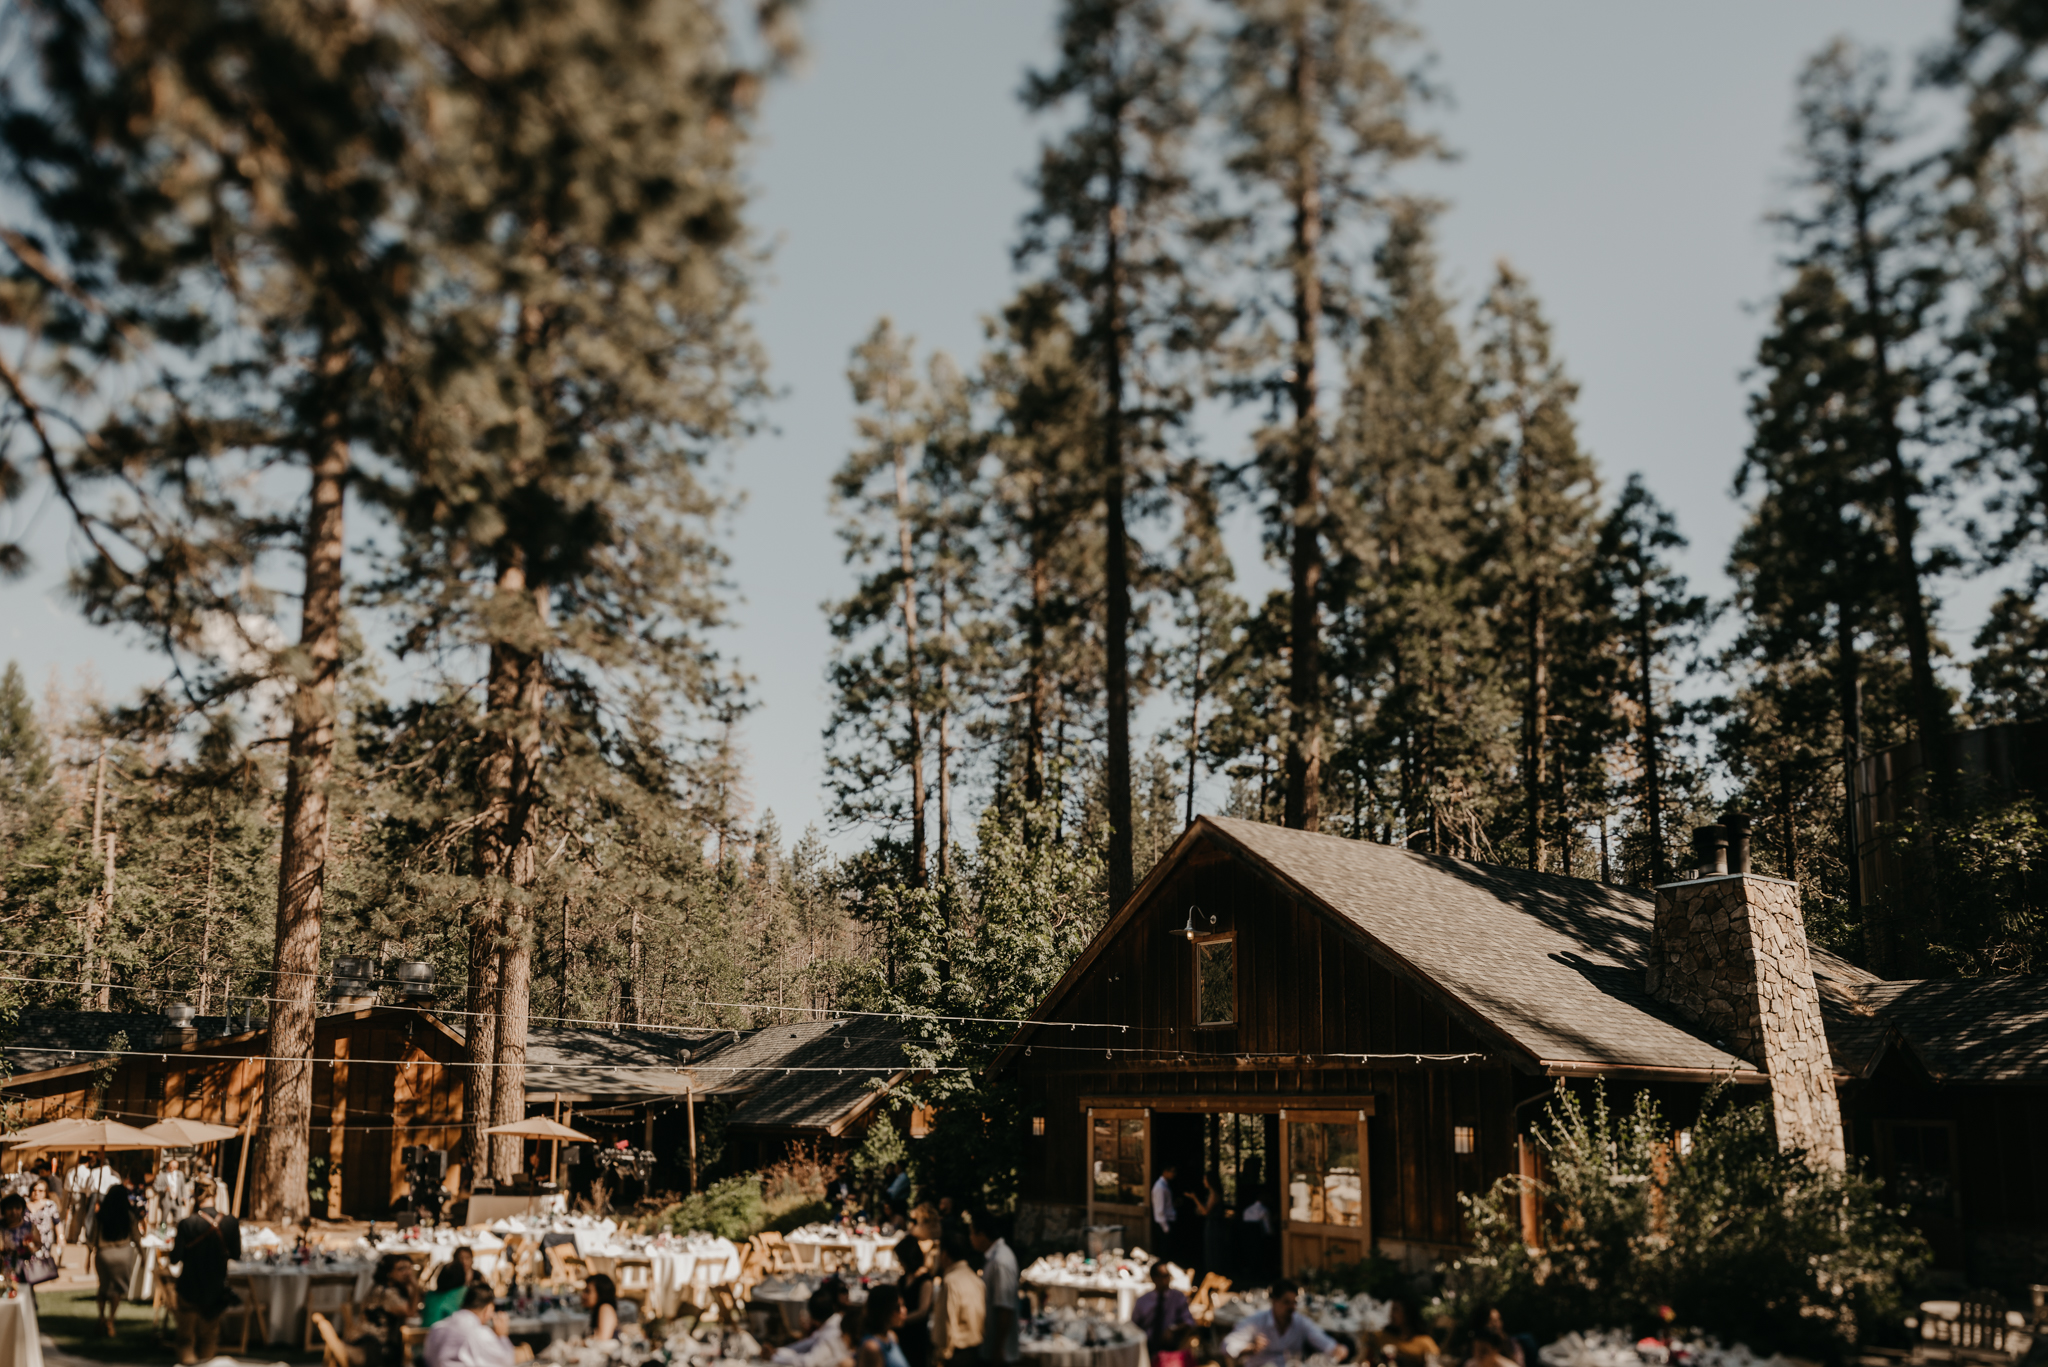 © Isaiah + Taylor Photography - Evergreen Lodge Destination Yoesmite Wedding - Los Angeles Wedding Photographer-159.jpg